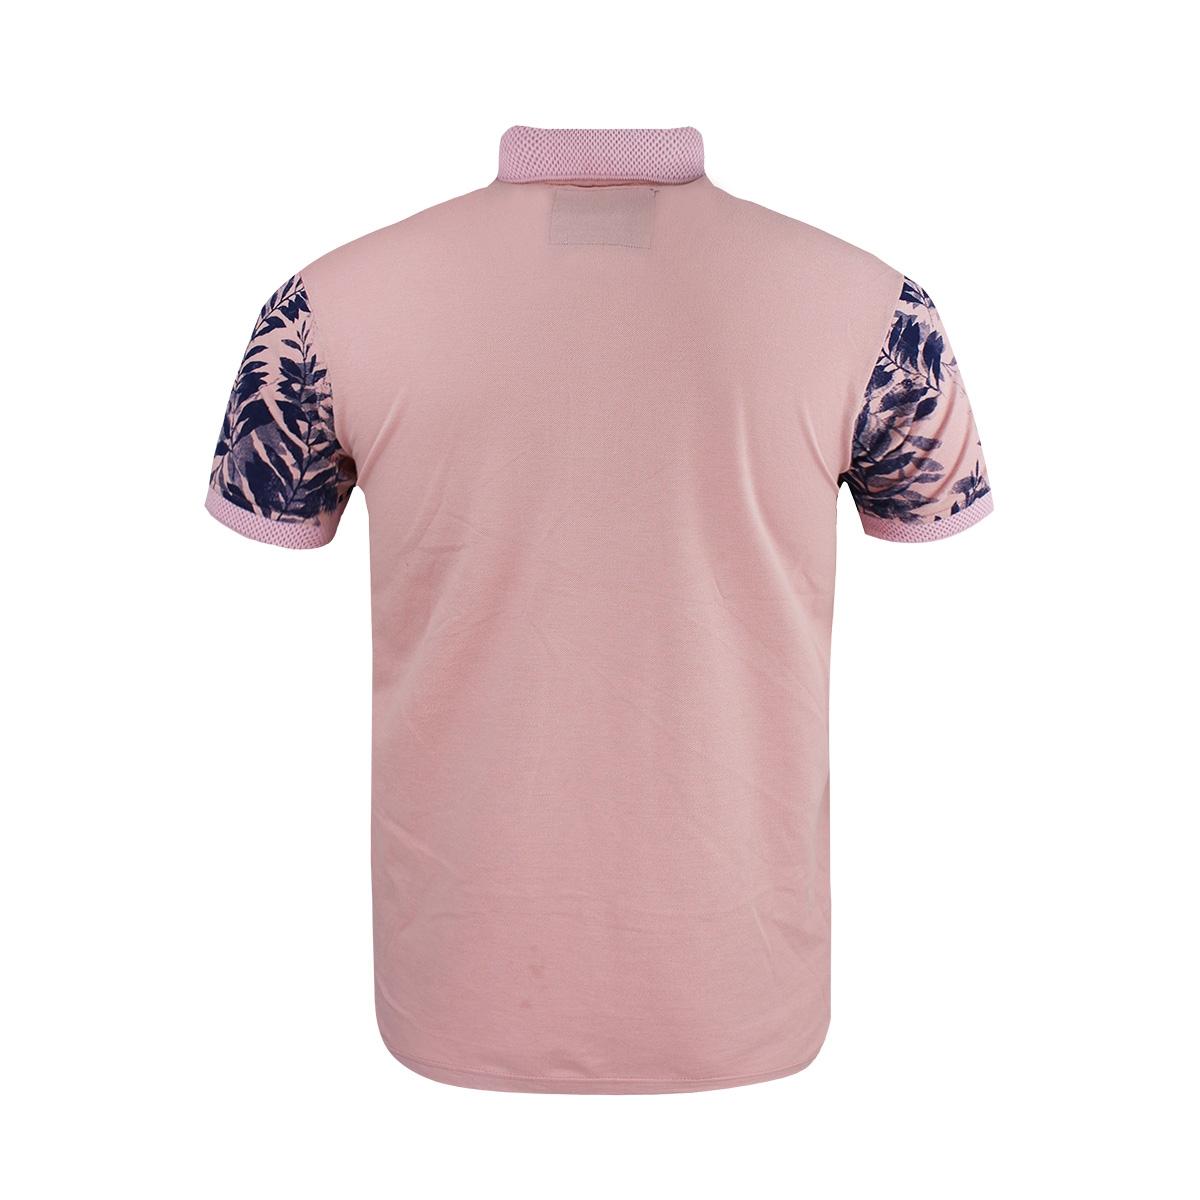 22131 gabbiano polo pink